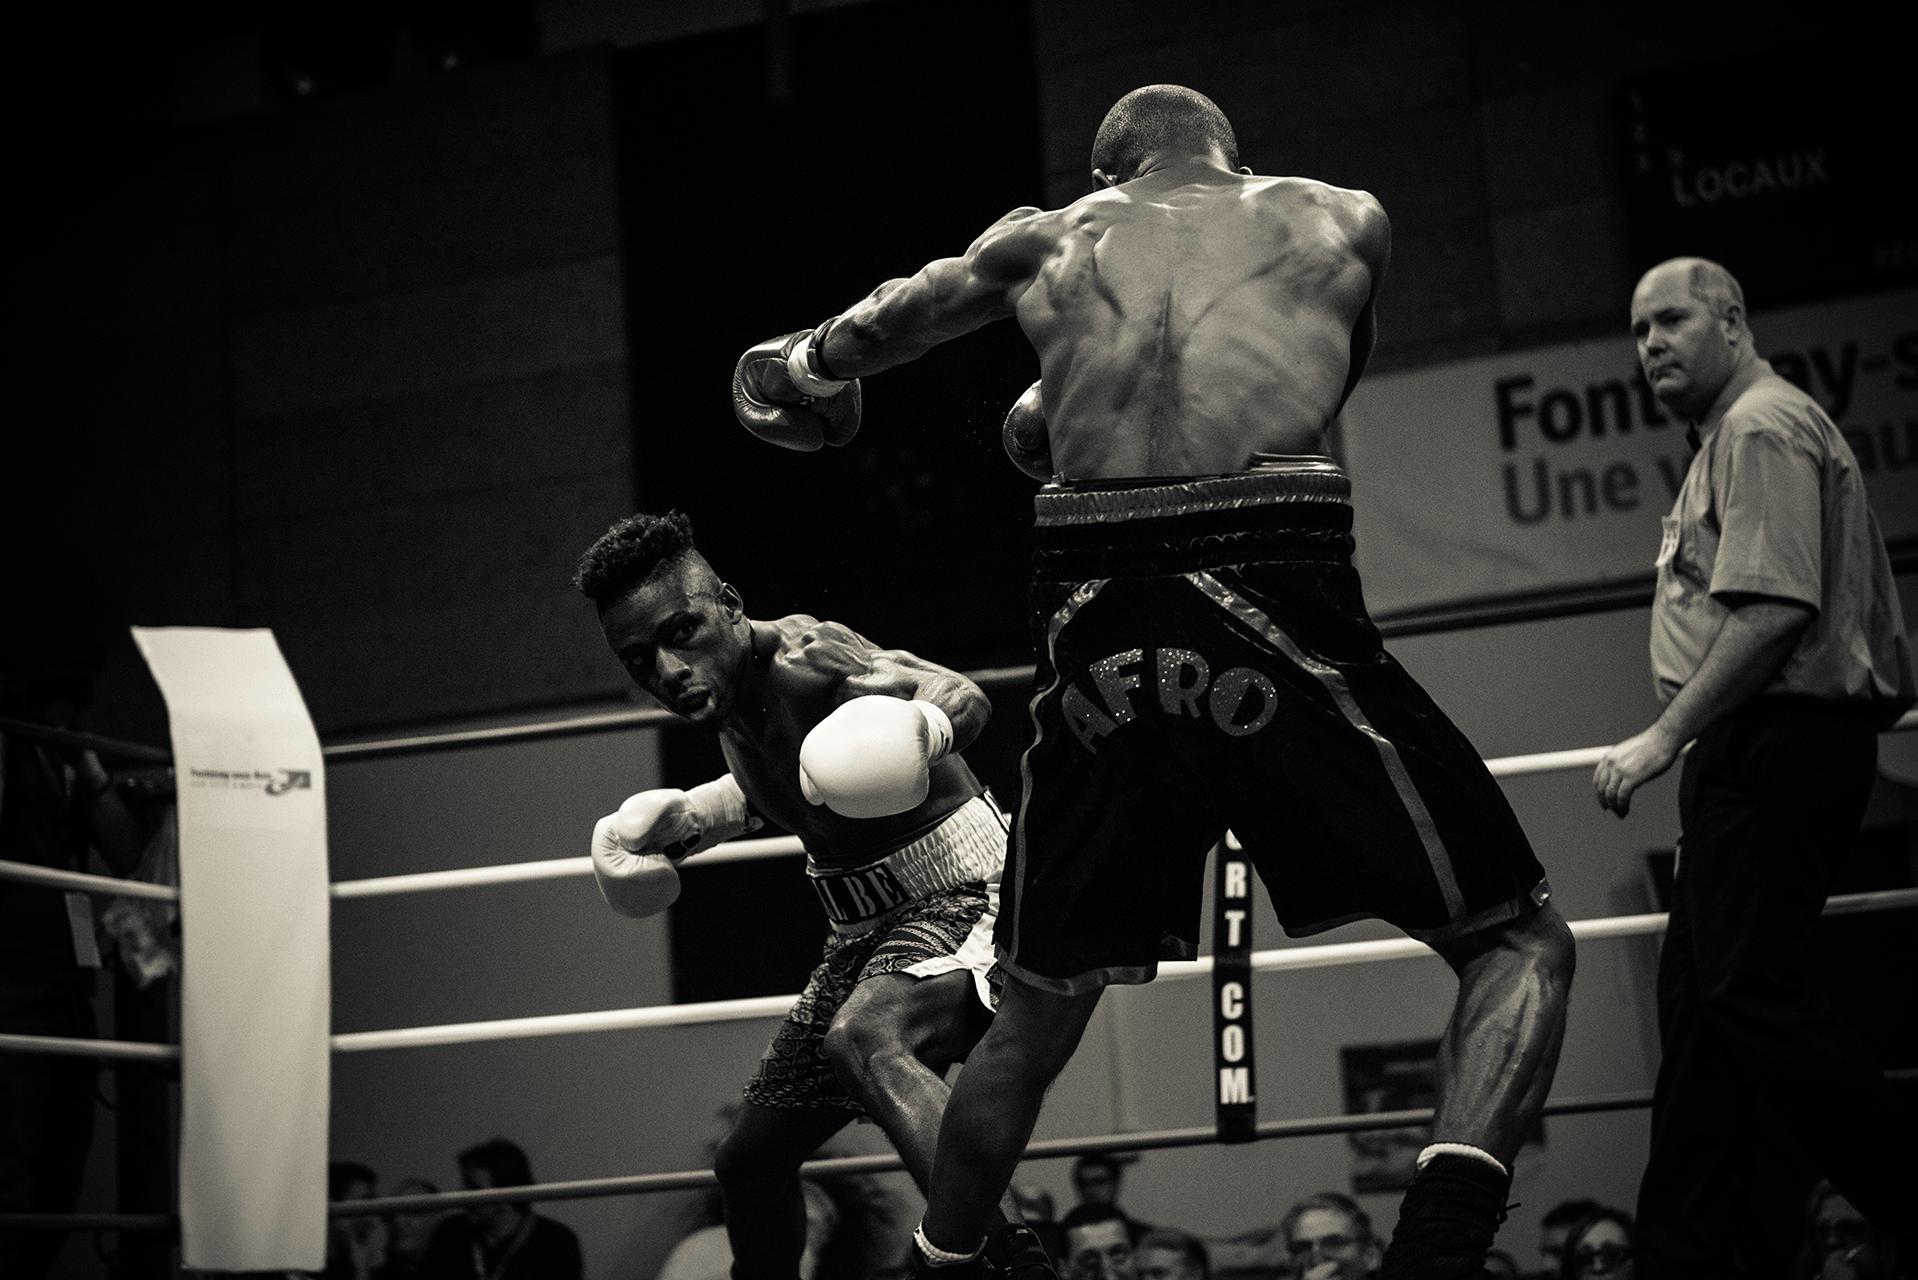 boxe-maya-angelsen-photographe-ile-de-france